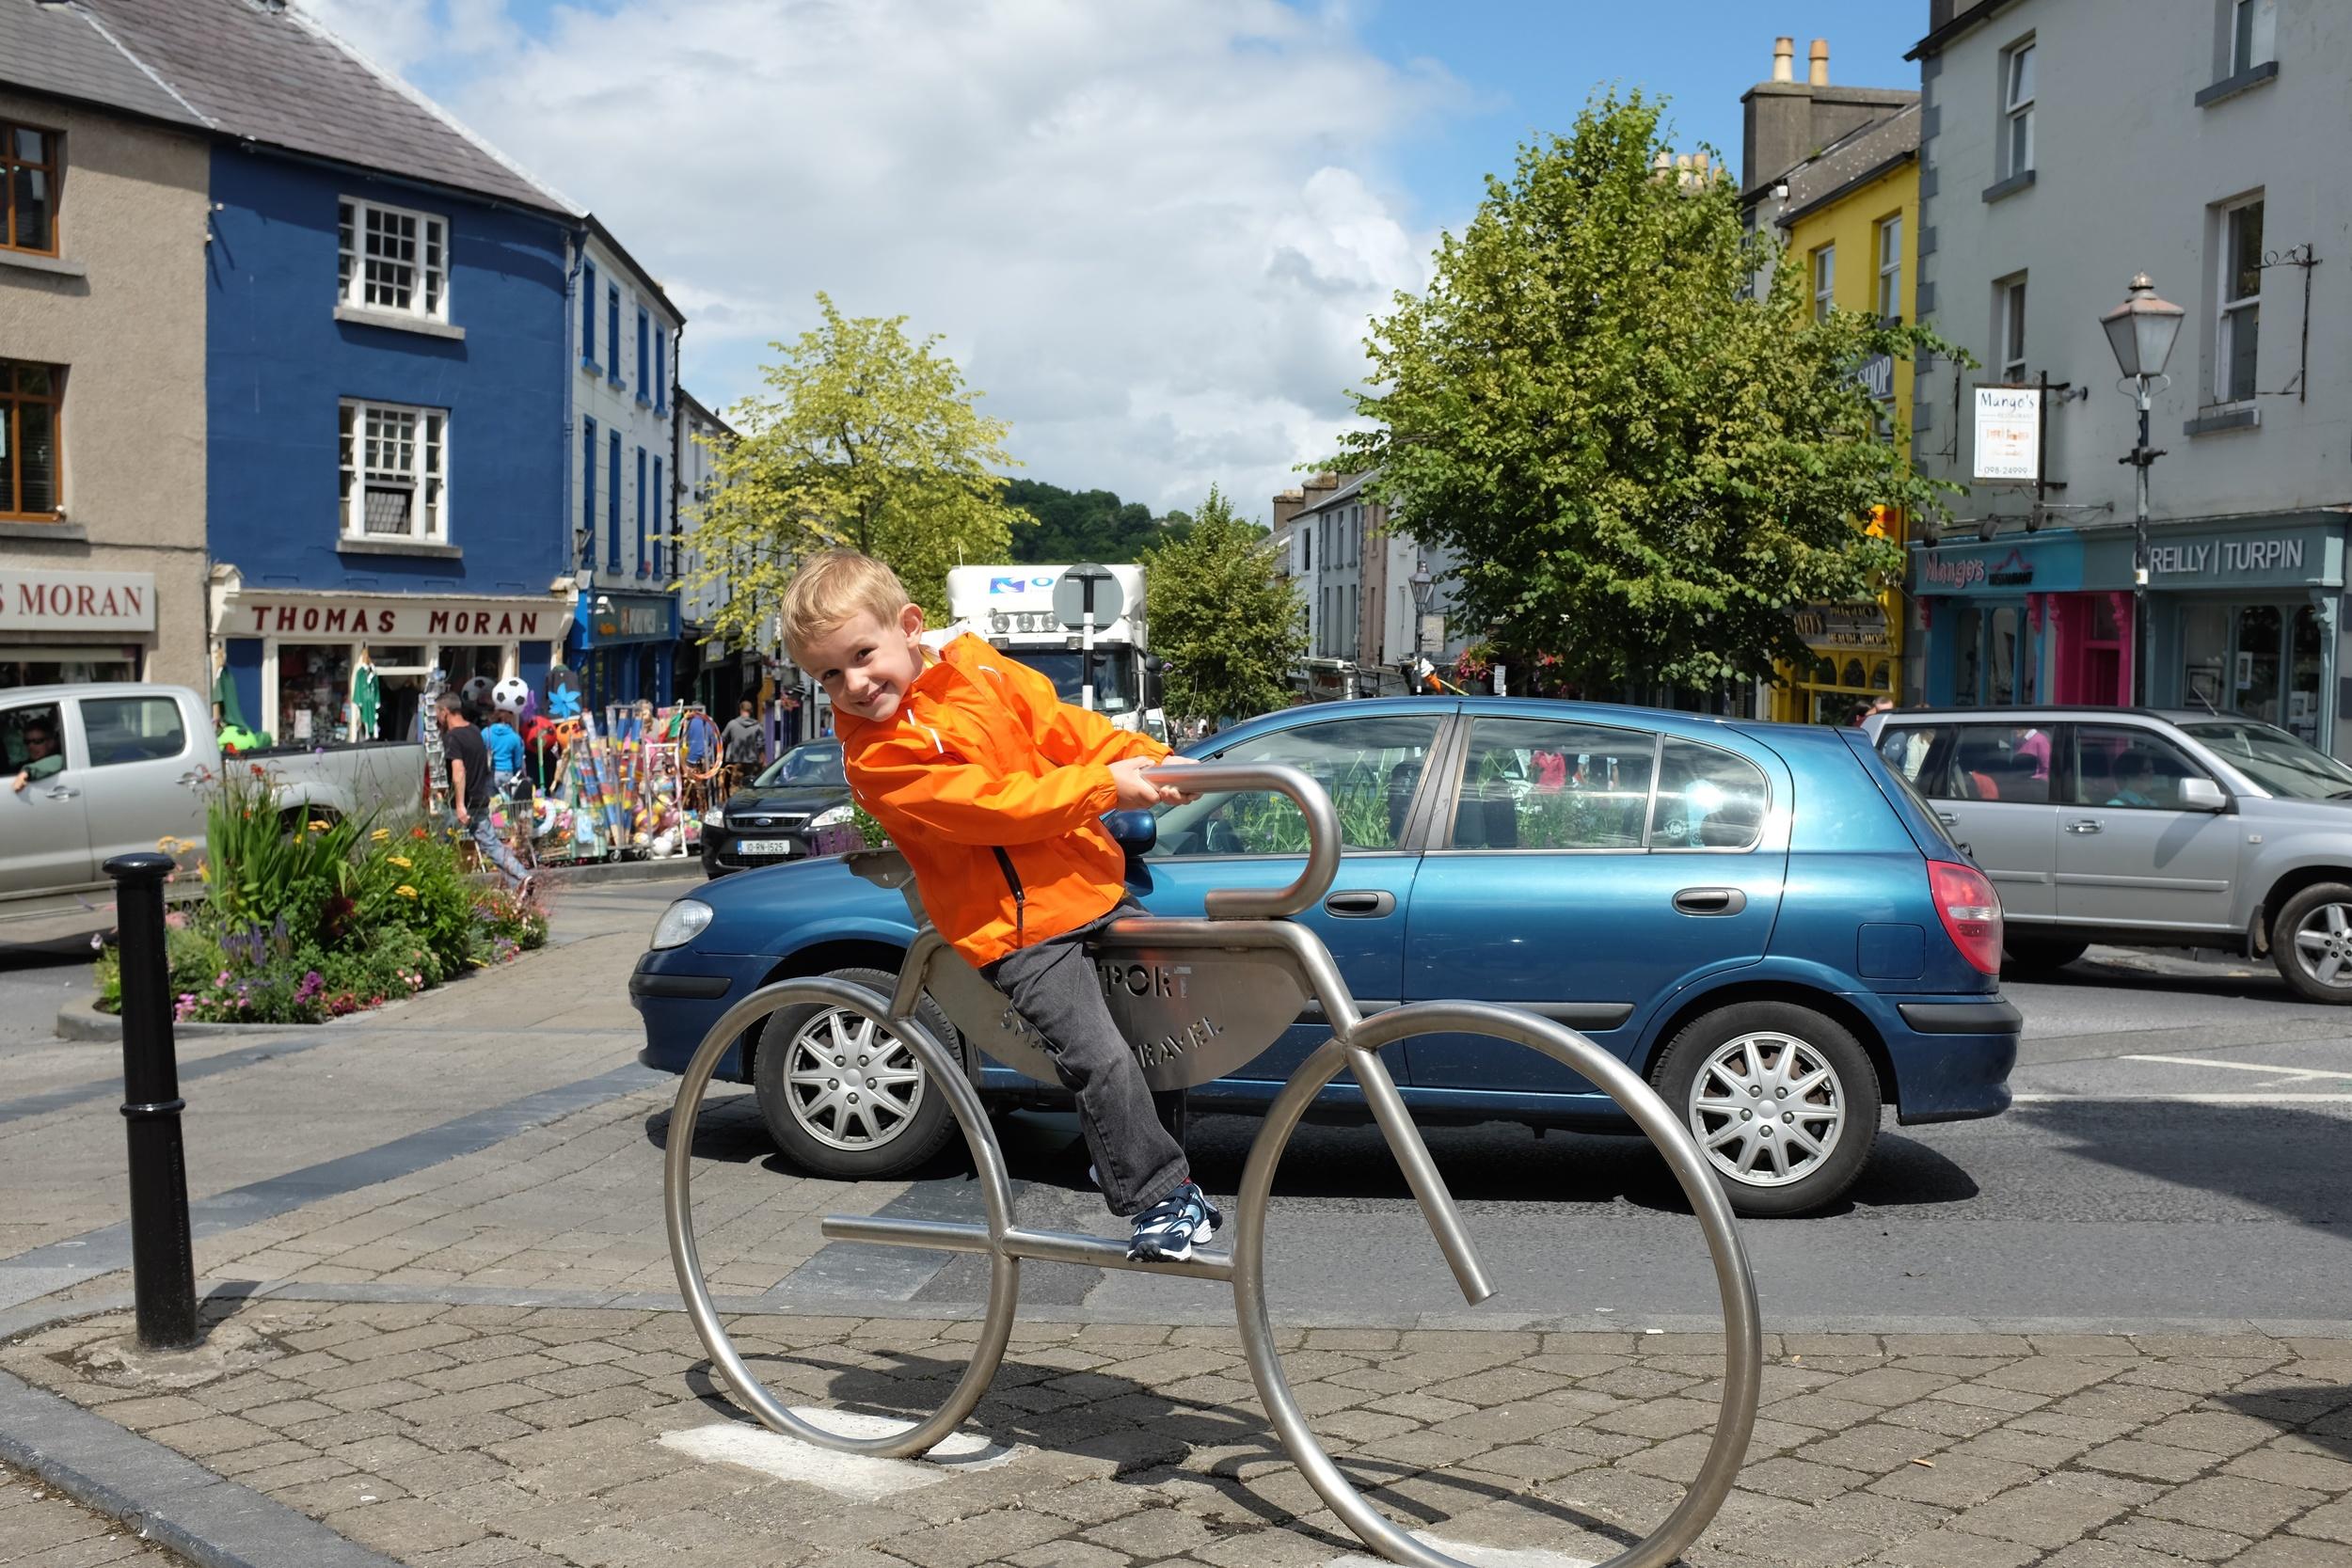 Kian on the metal bicycle